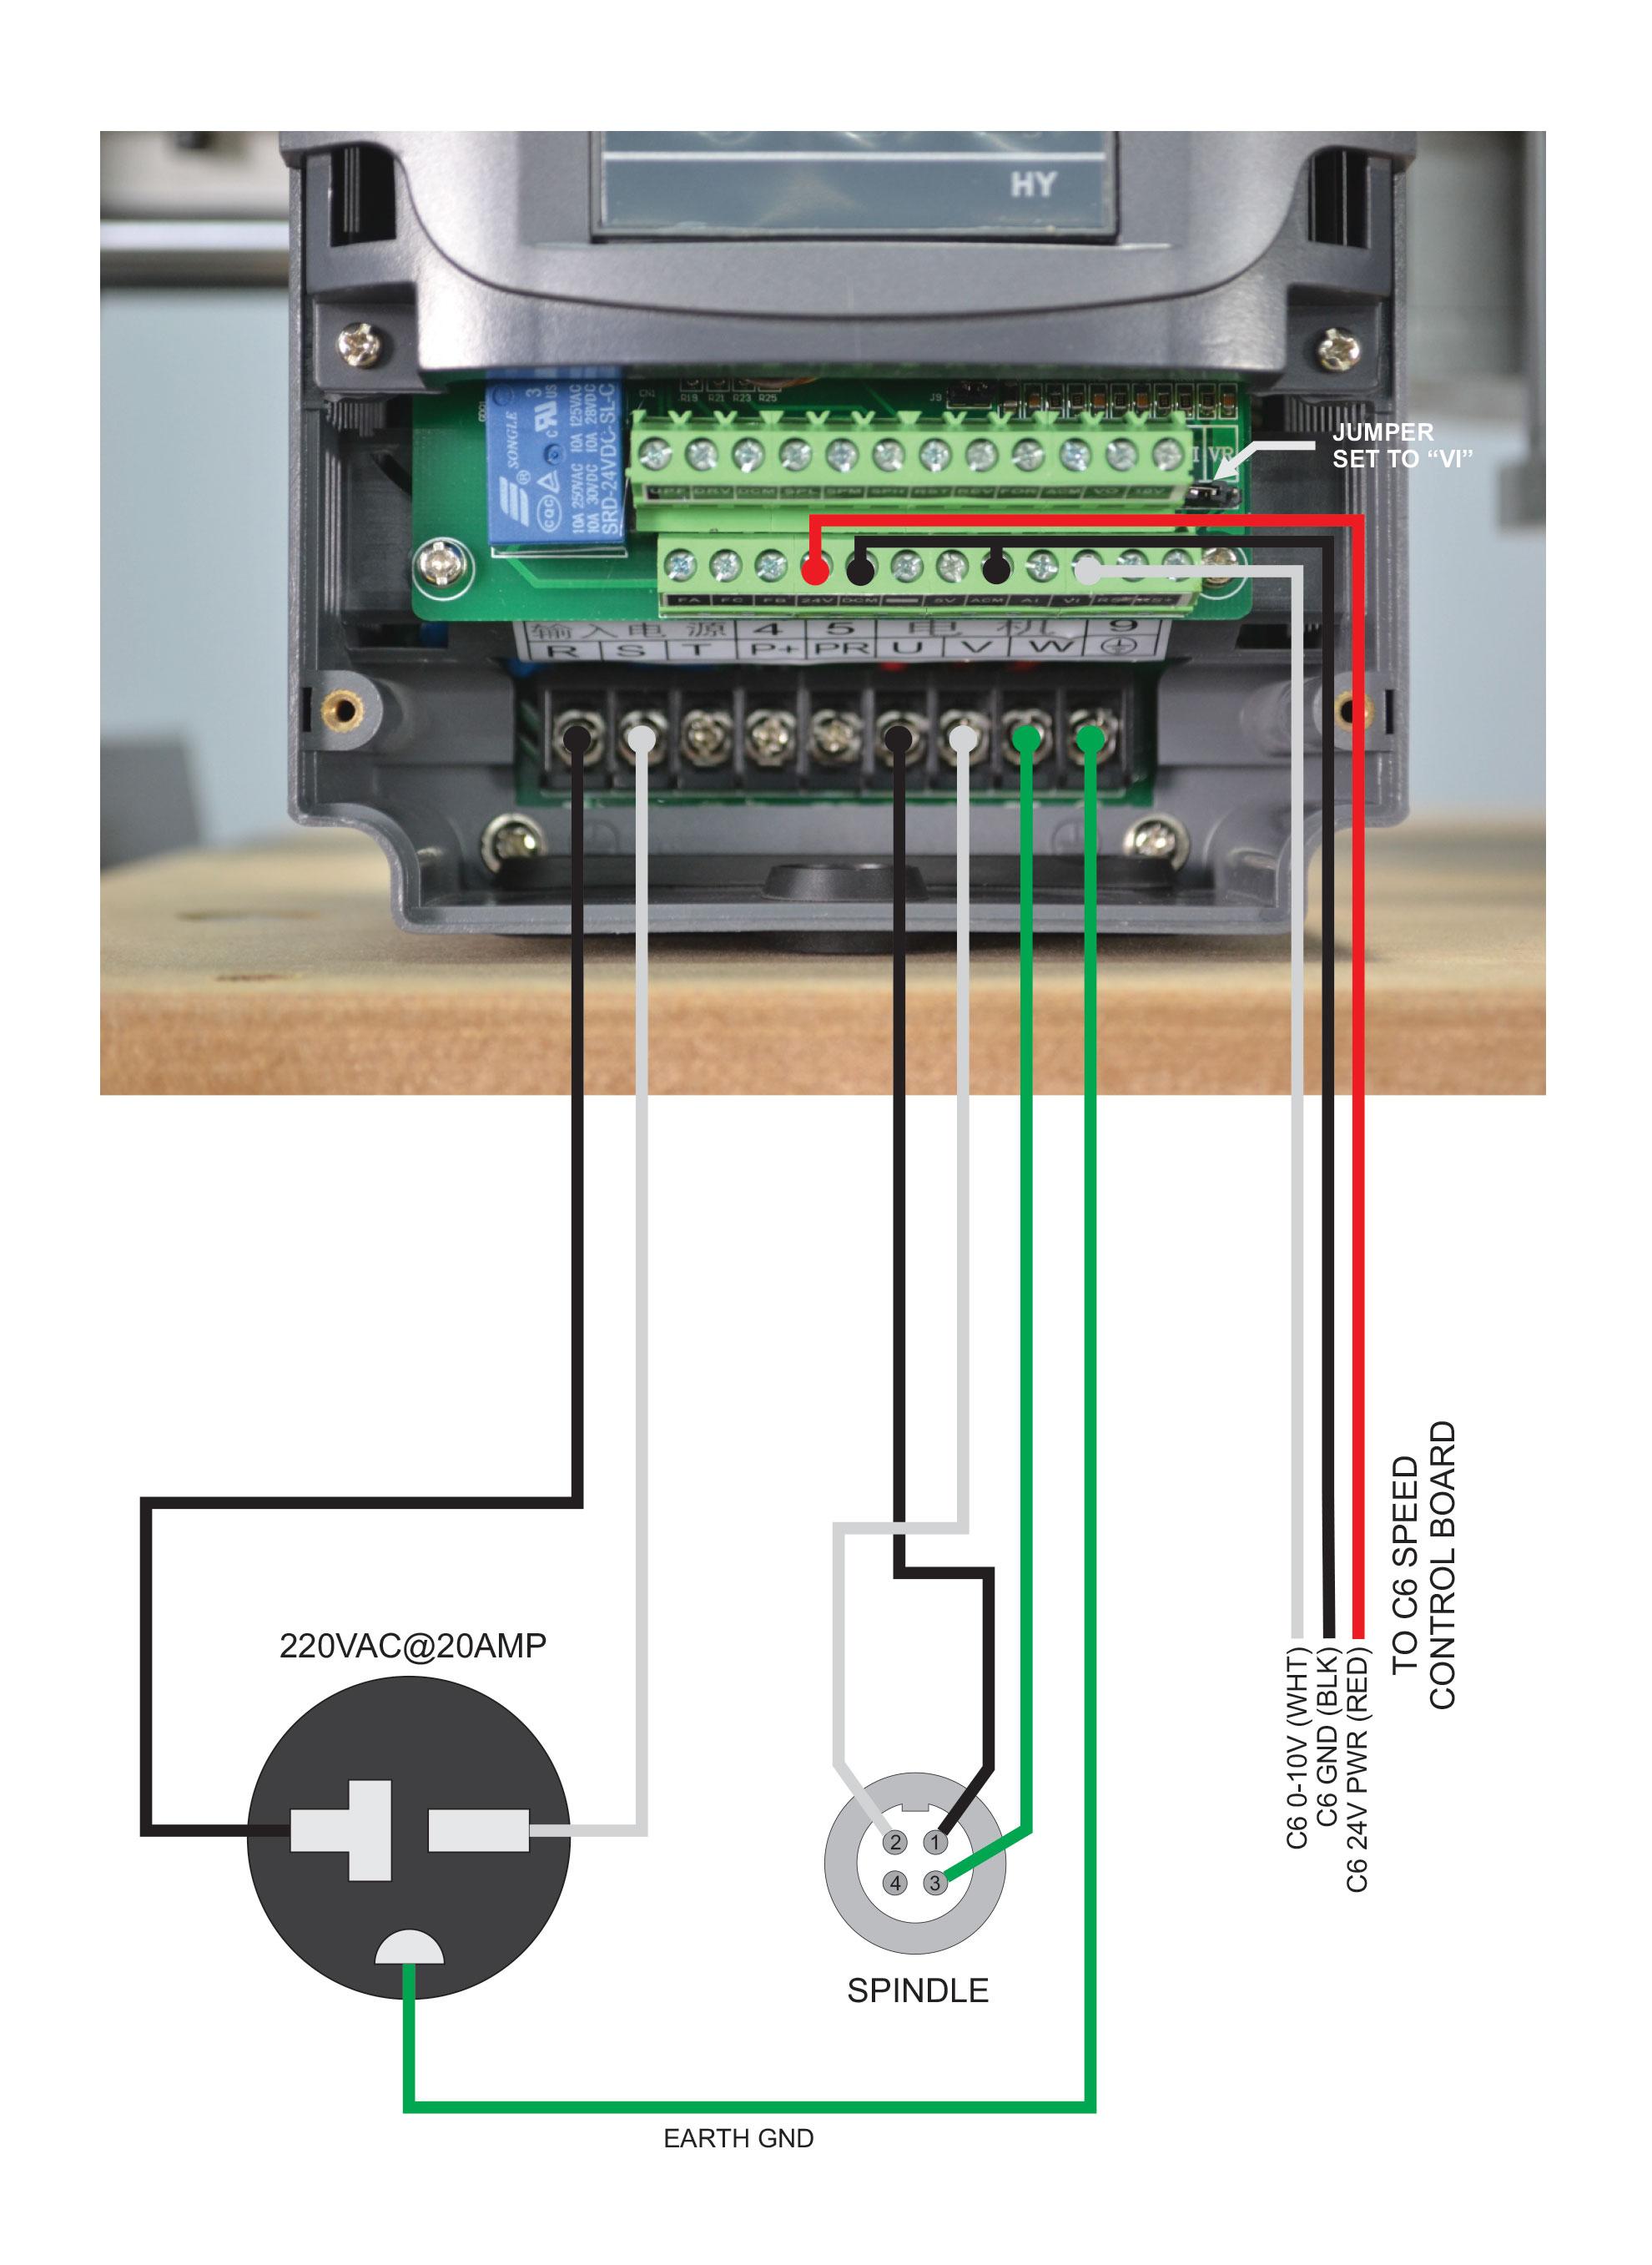 5 axis cnc breakout board wiring diagram of car alarm system relay driver elsavadorla